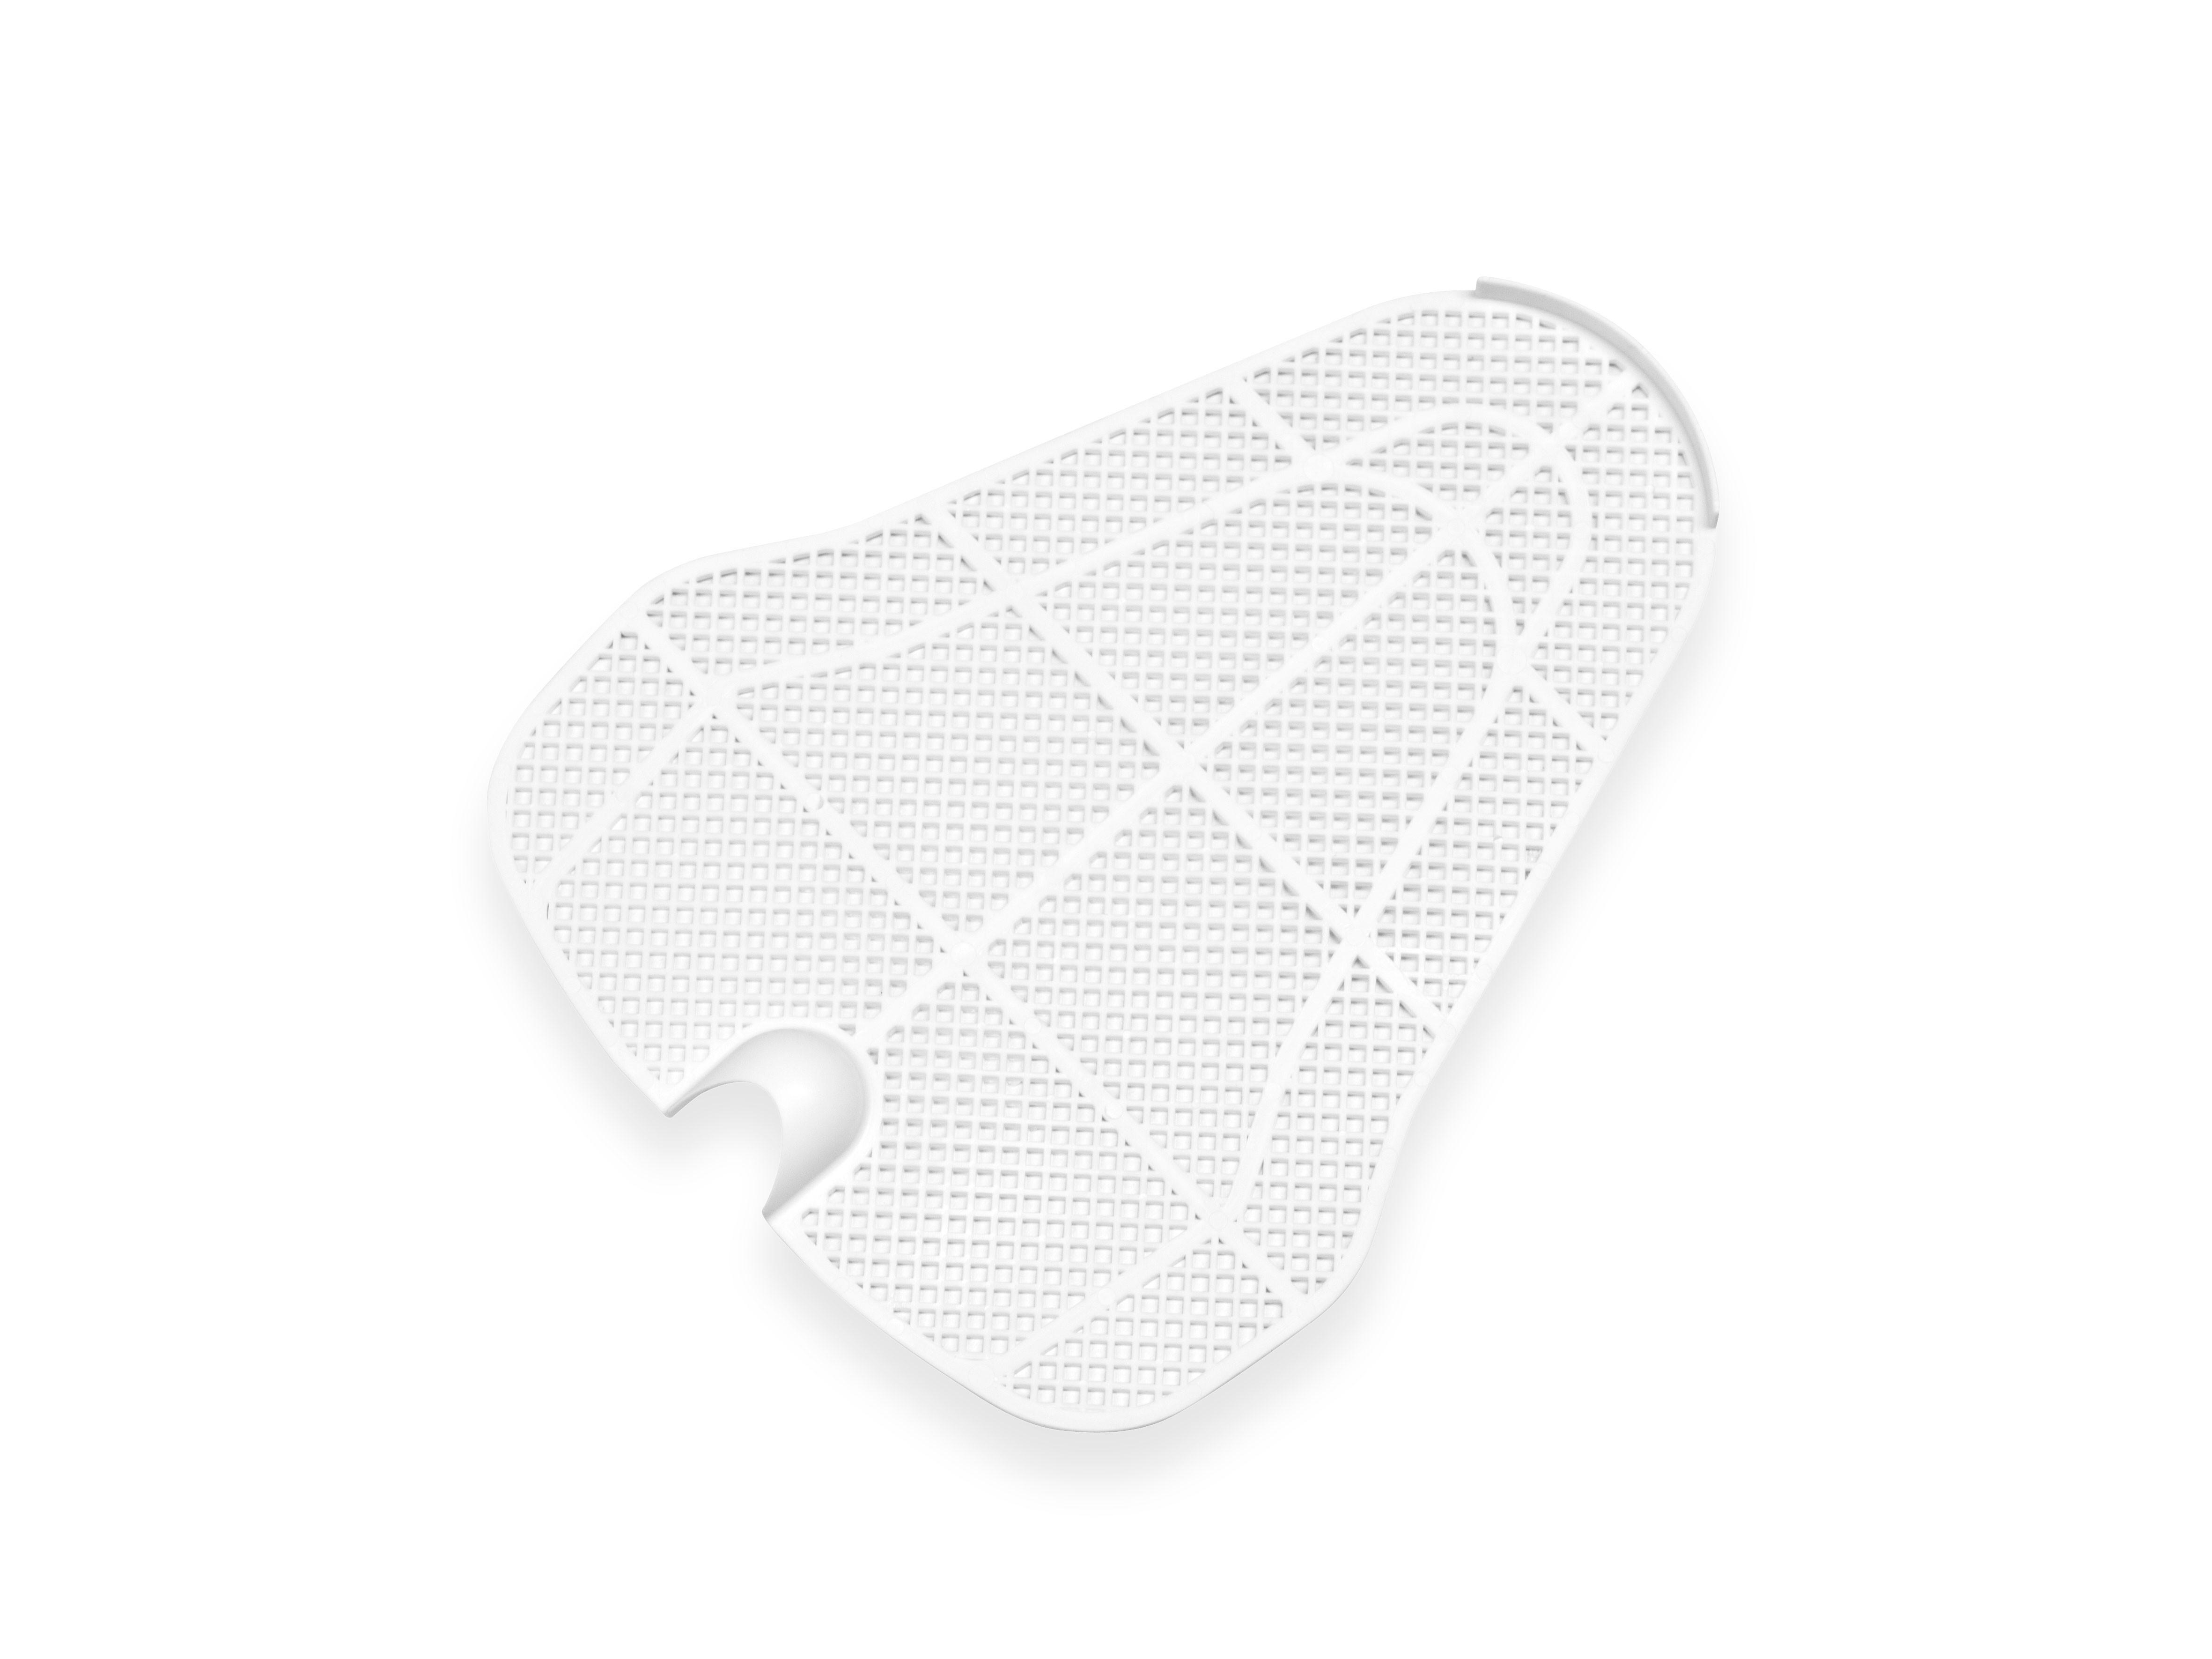 Urinalsieb / Schutzsieb, groß 31 cm, (4 Stück)